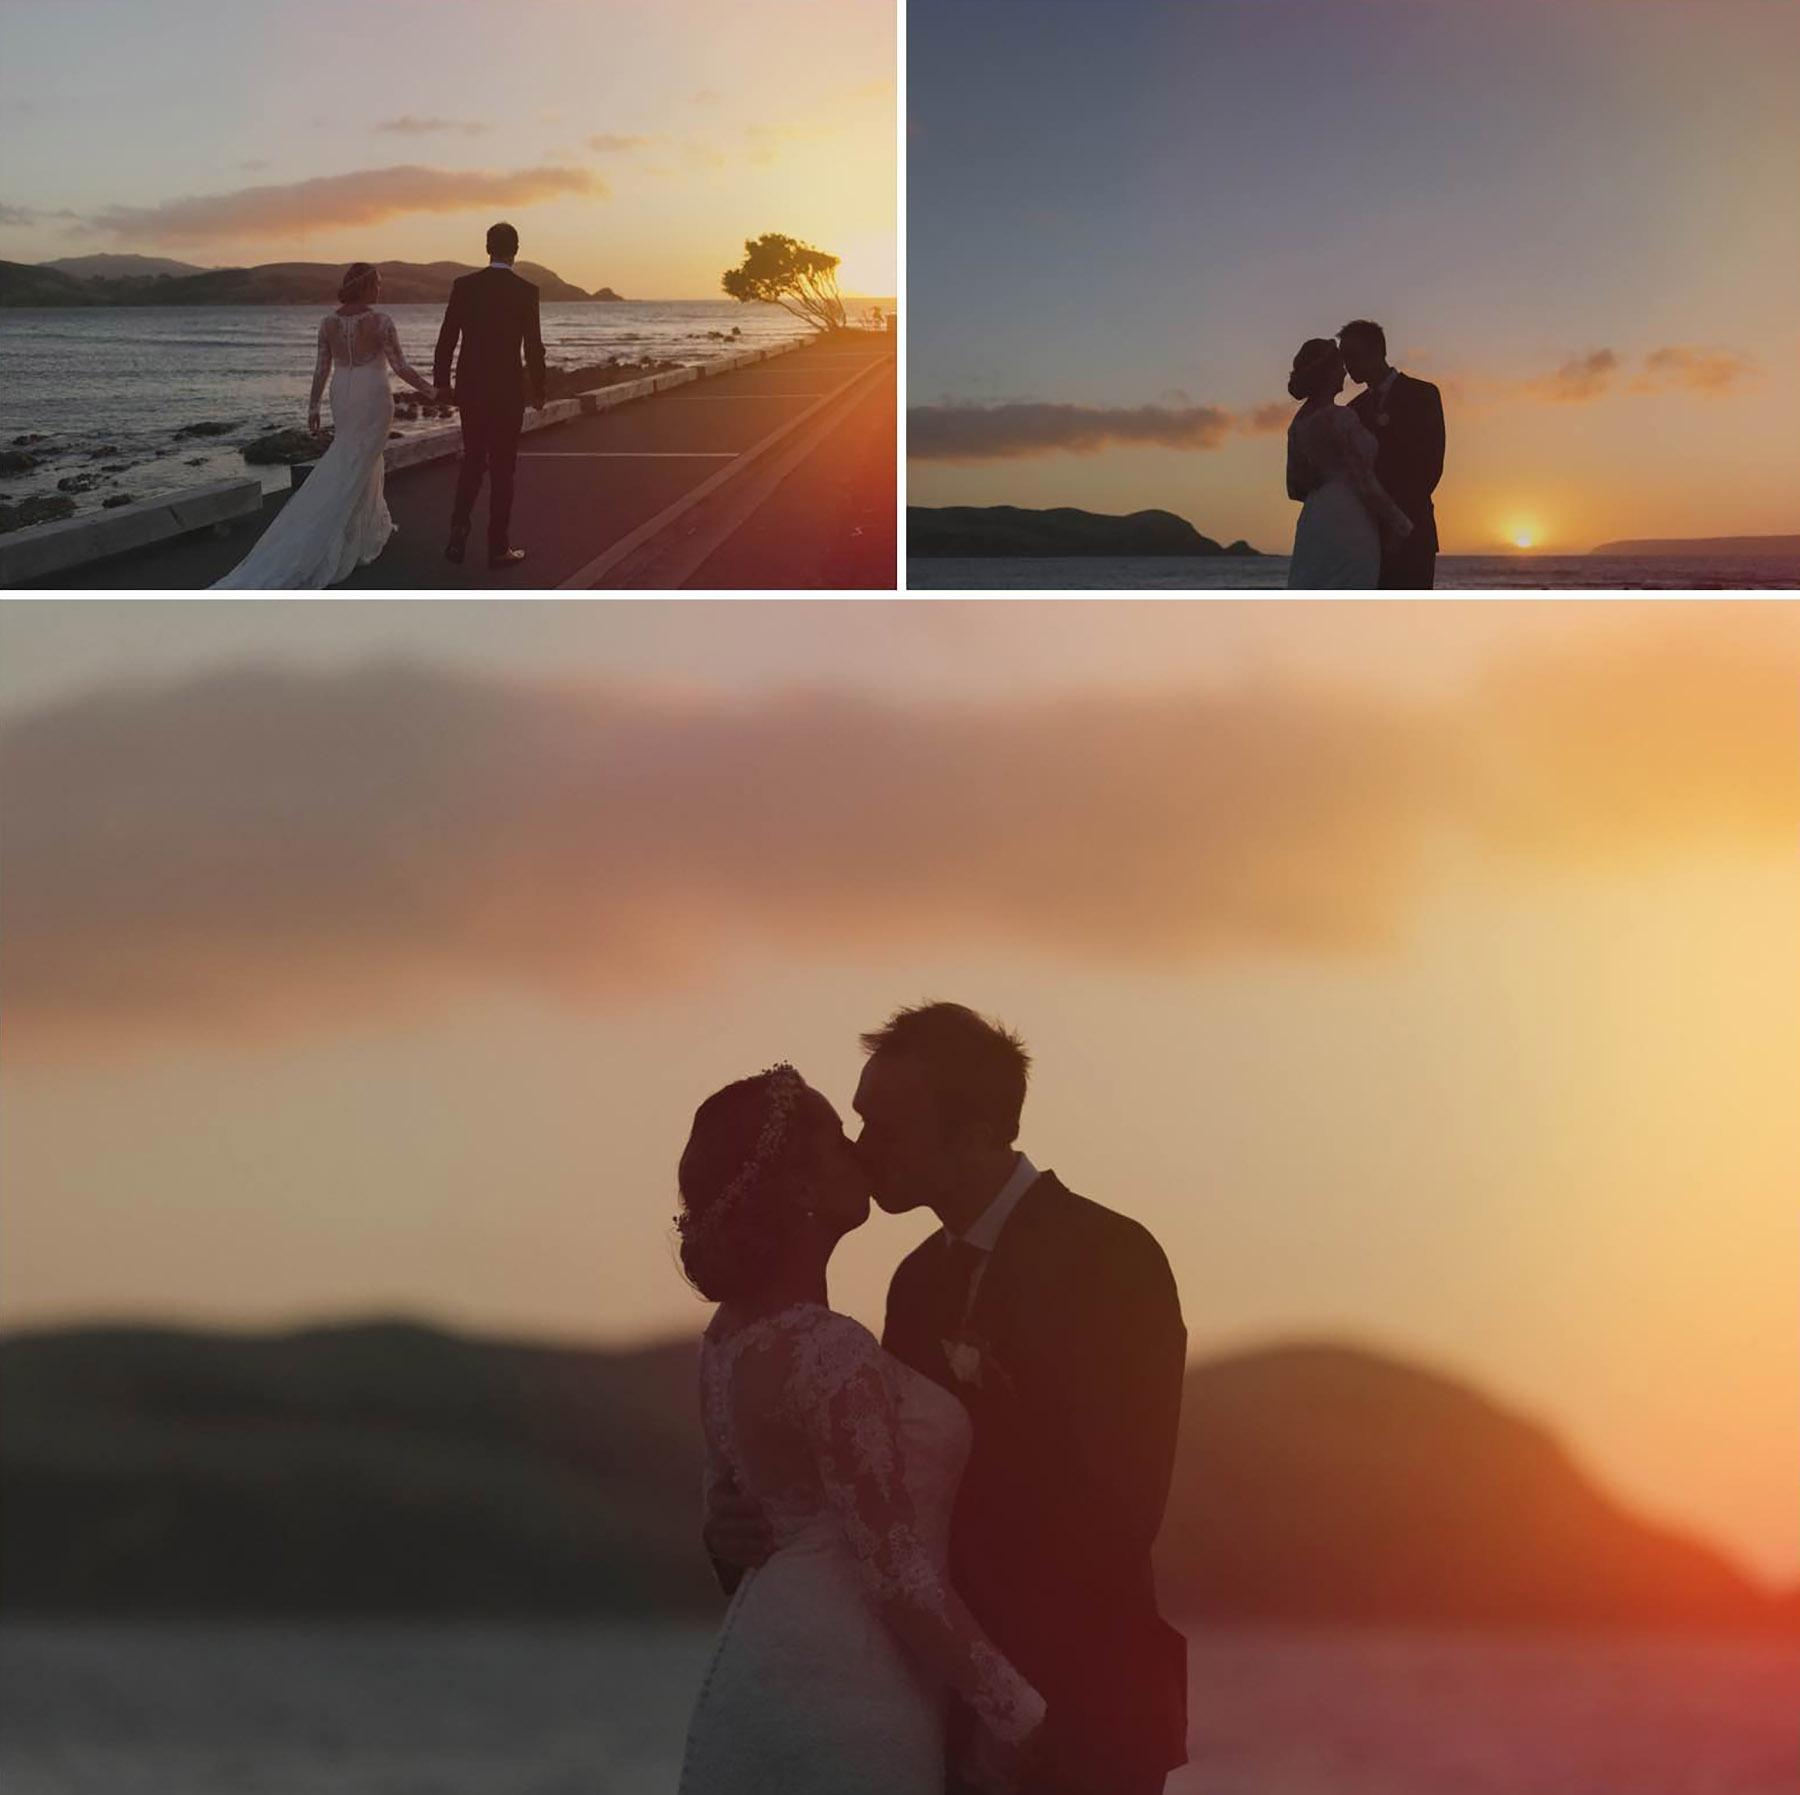 Jenna and Matt's wedding in Plimmerton, wellington, NZ. Images - Siaosi Photography.